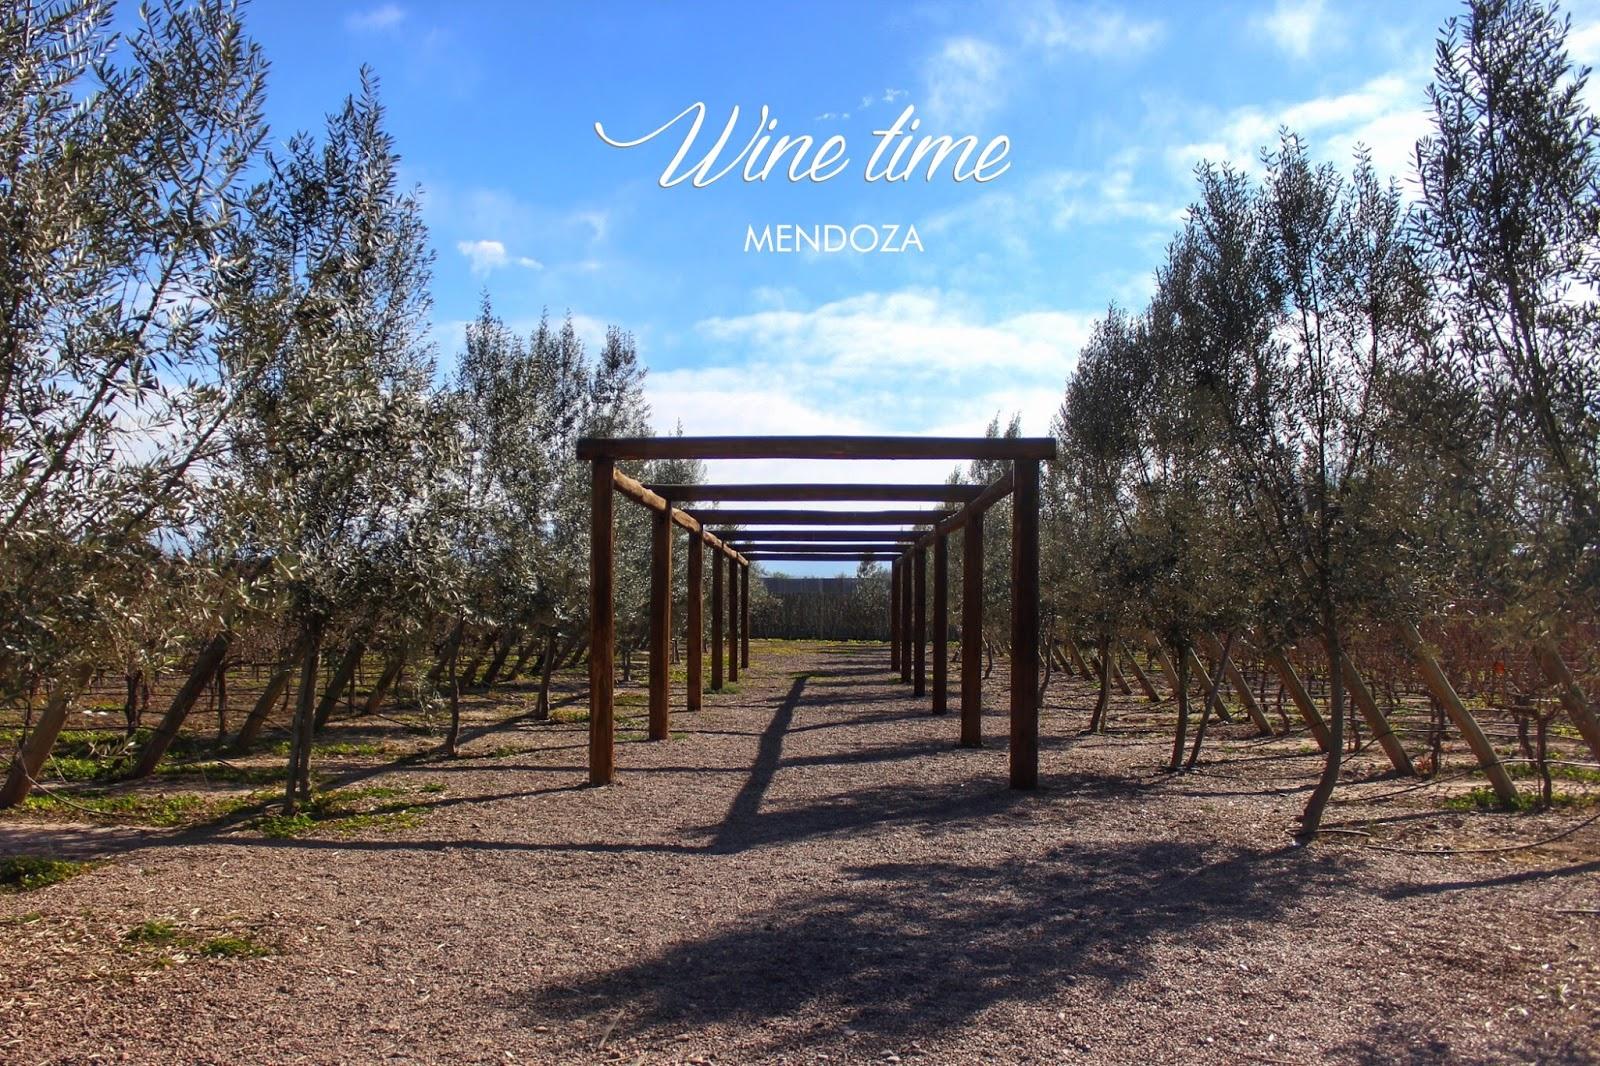 lifesthayle-wine-time-bodega-domiciano-parreiras.JPG